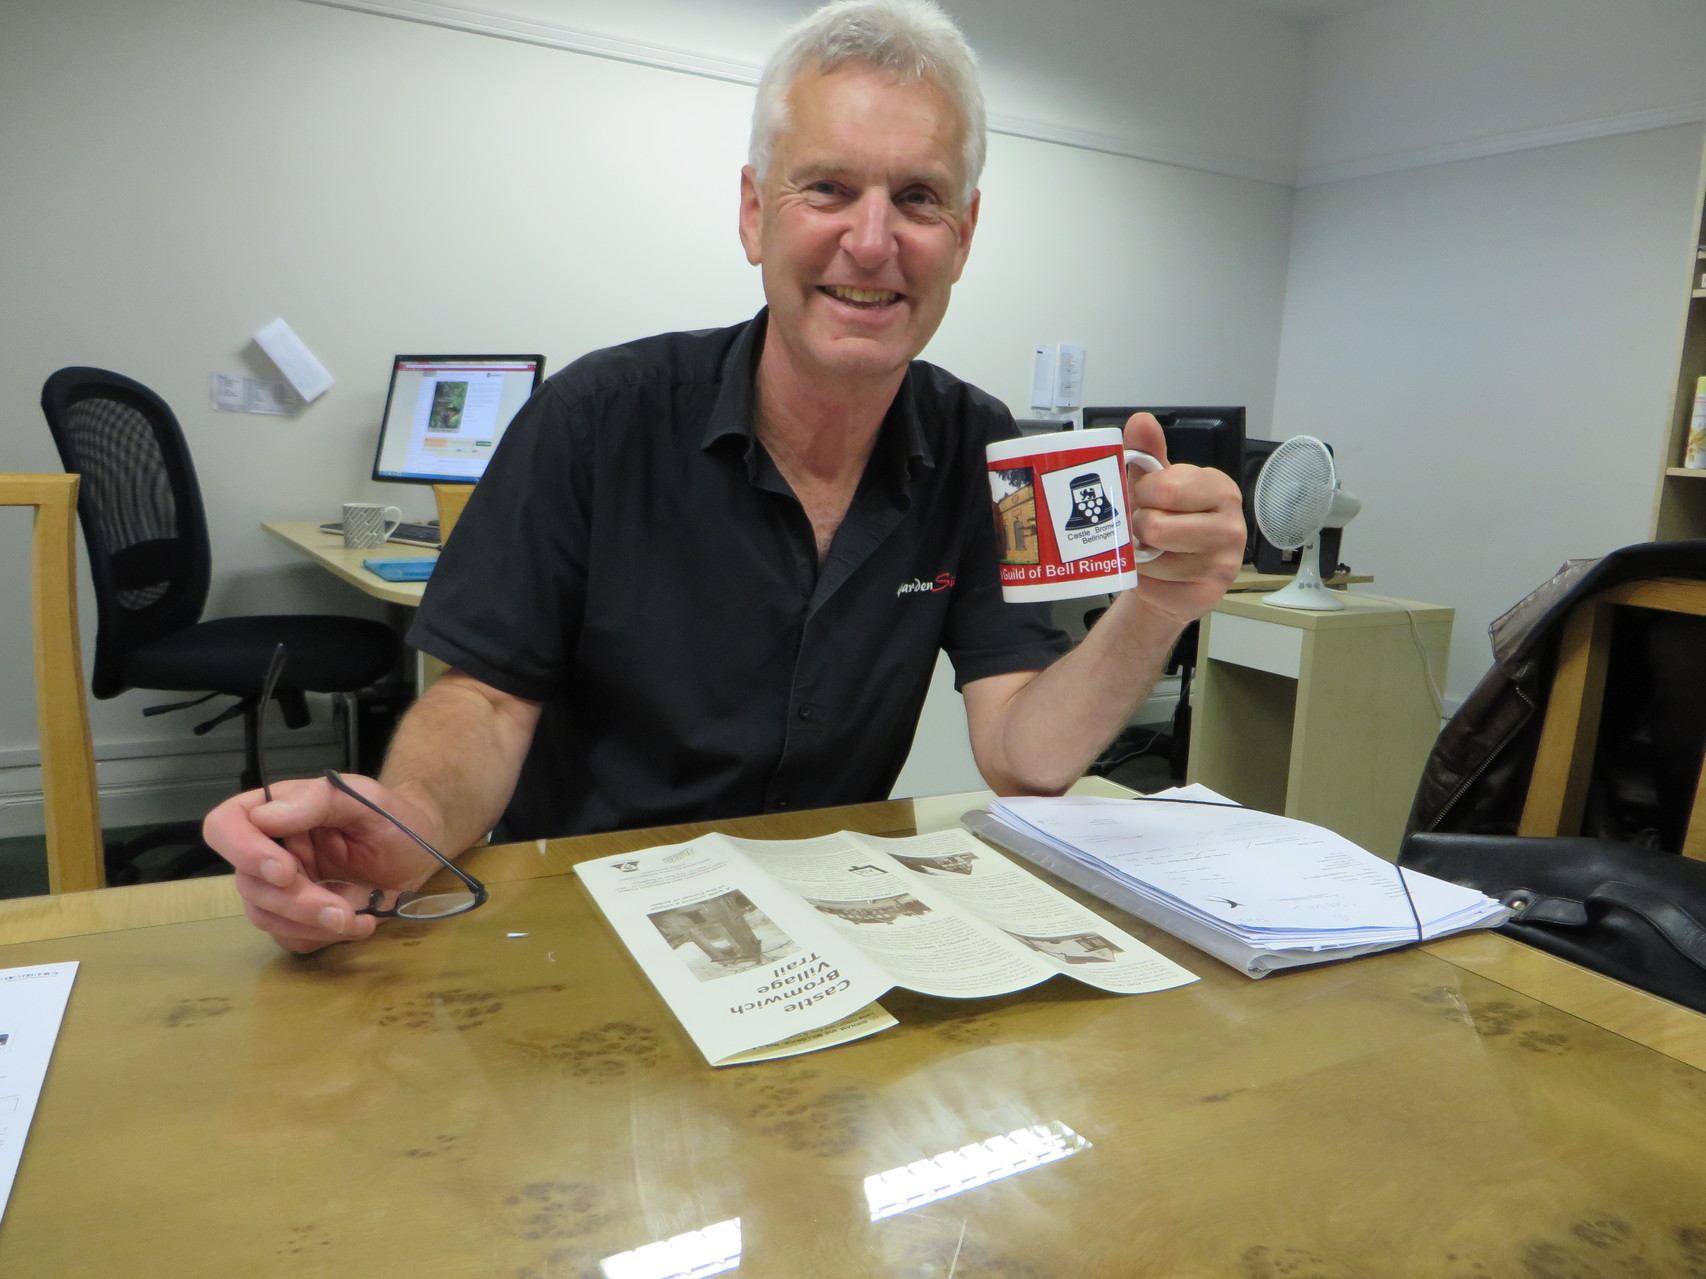 Robert Hall of Hall's Garden Centre - he's no mug!